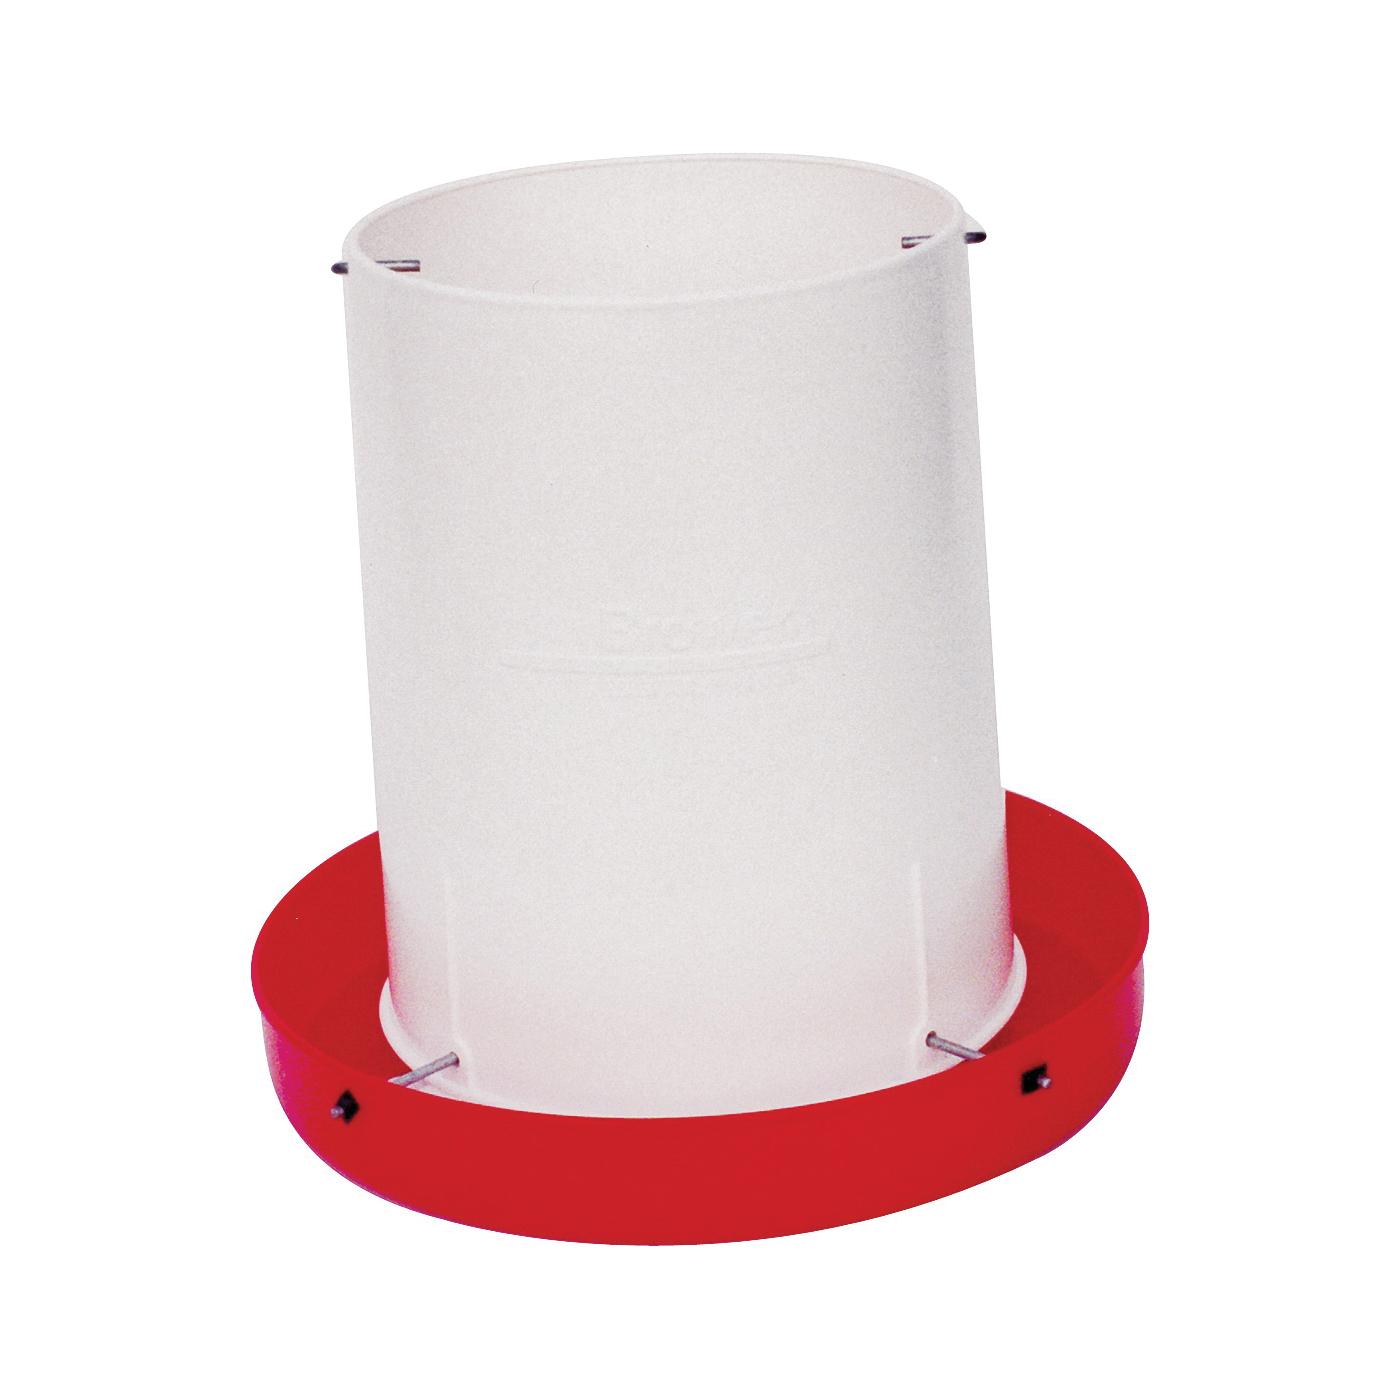 Picture of FORTEX-FORTIFLEX HF15 Hanging Feeder, 16 lb Capacity, Polyethylene